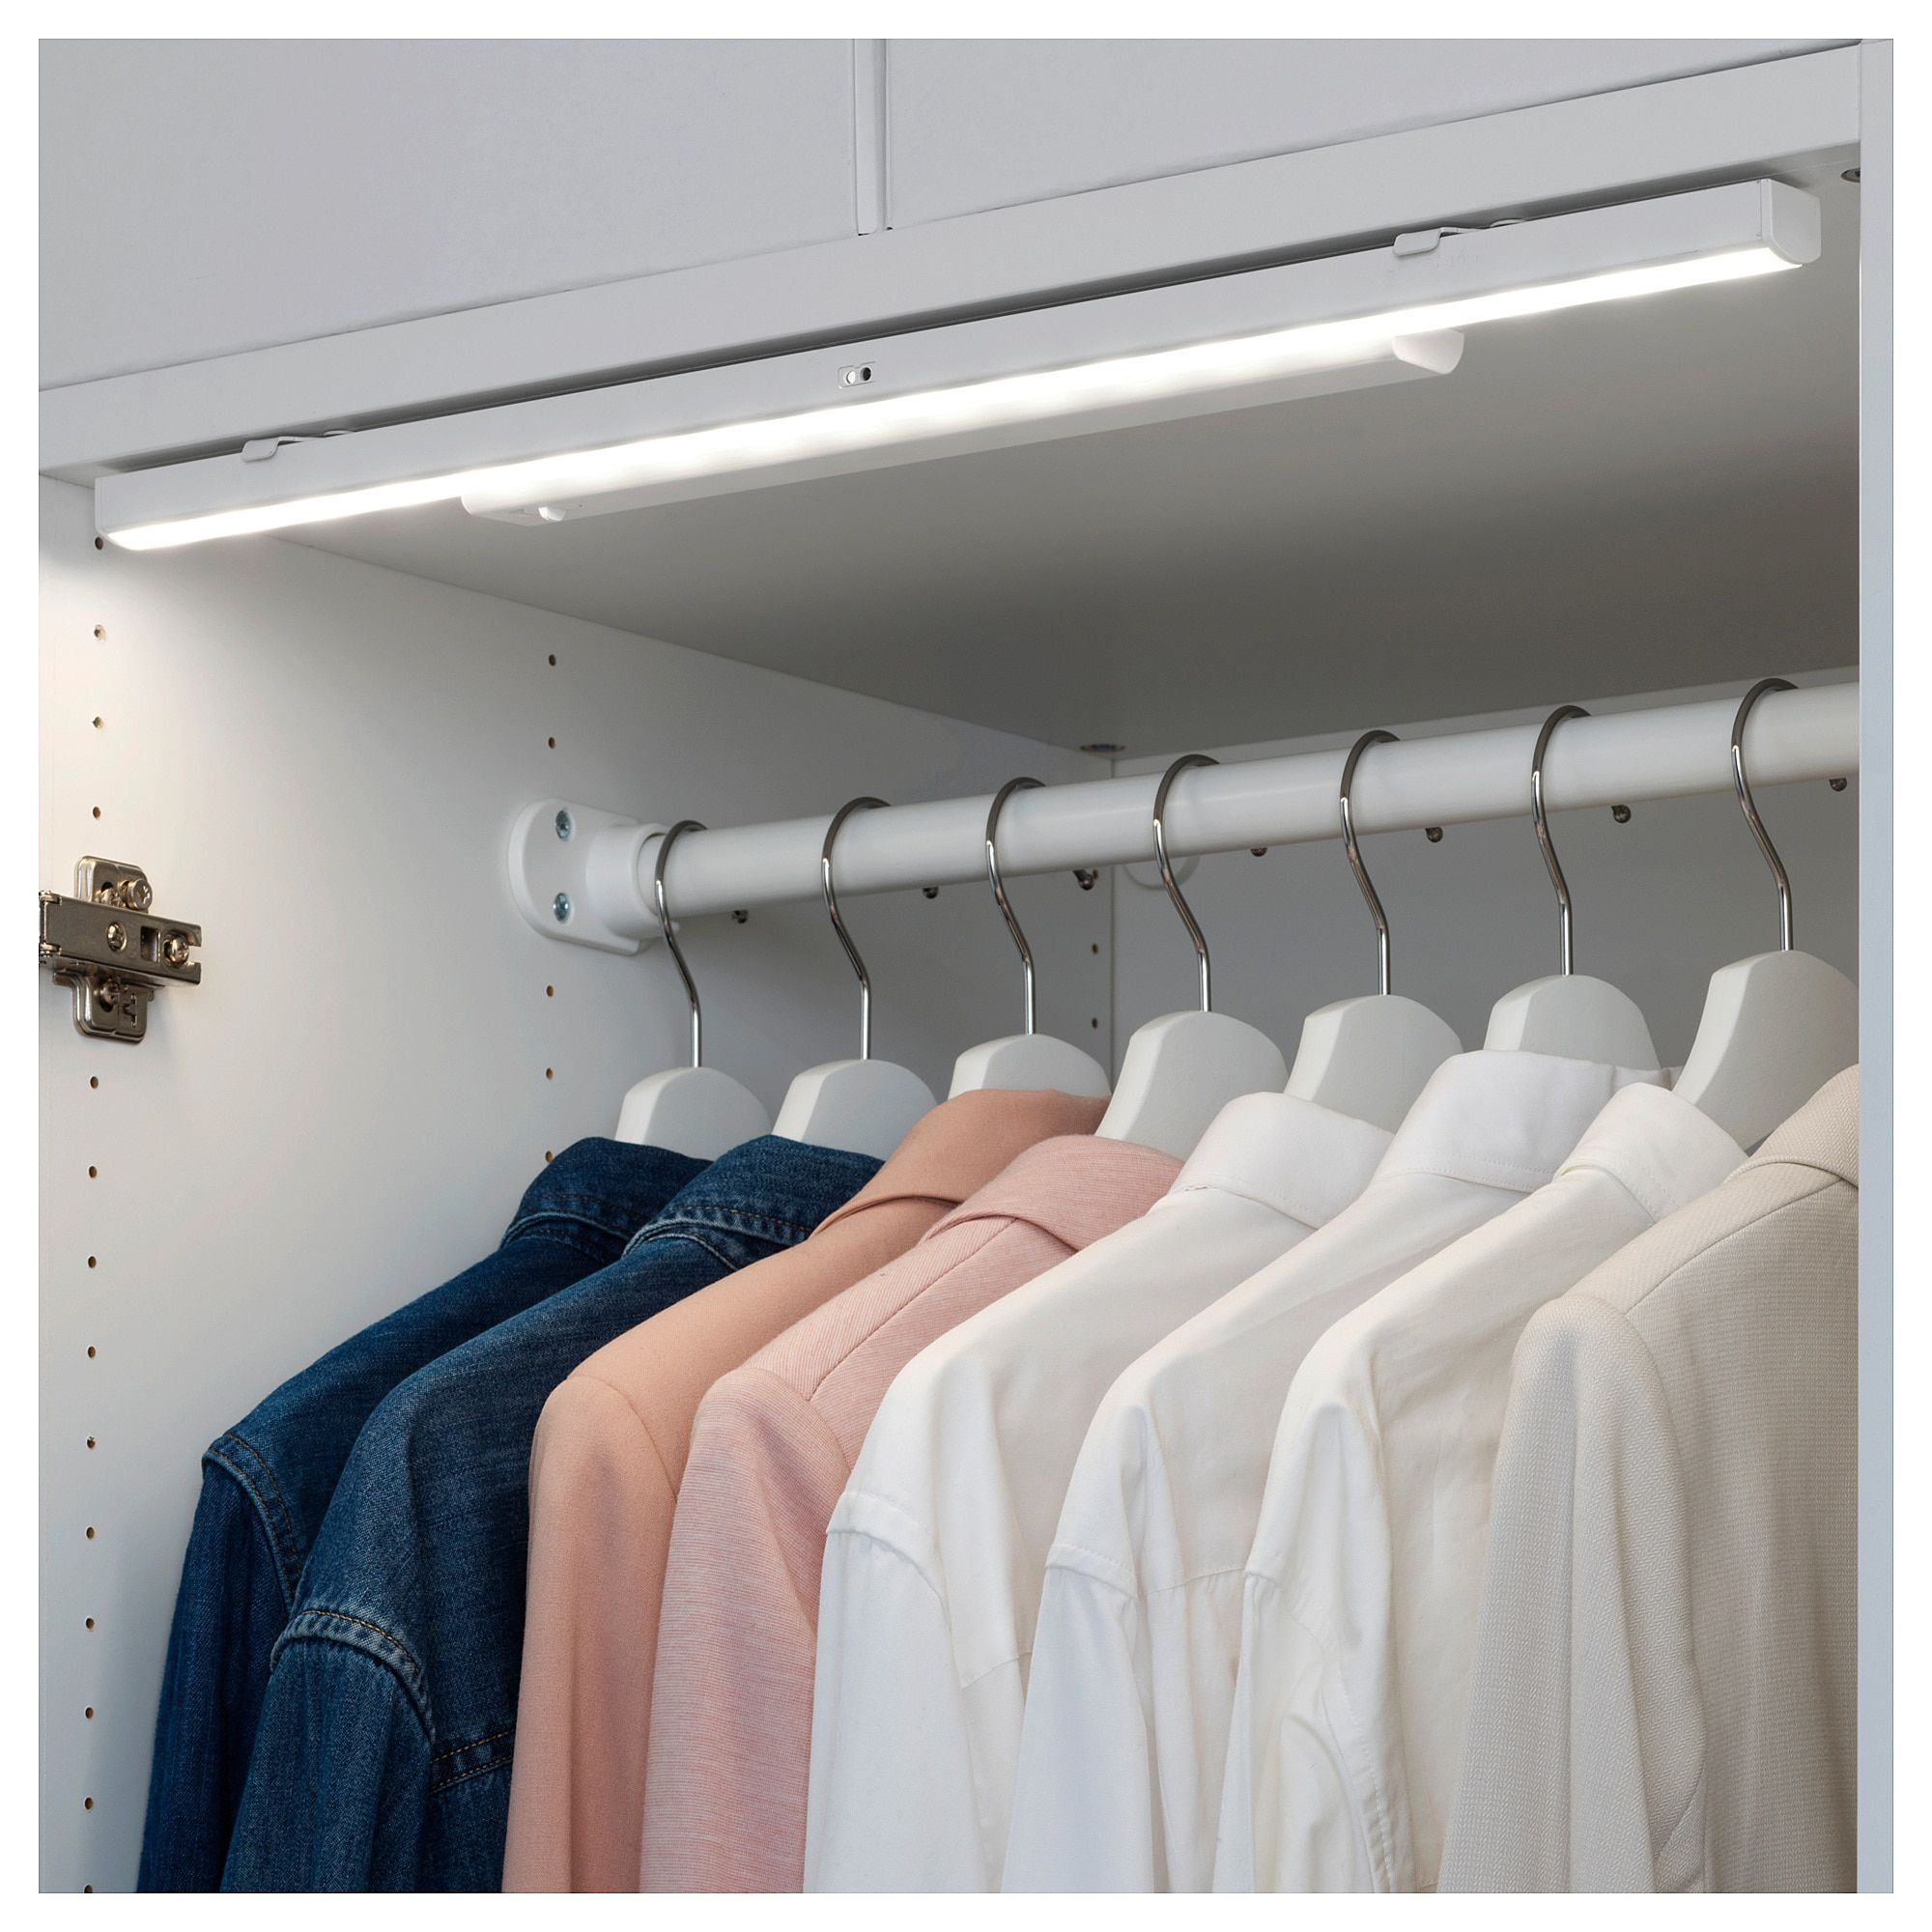 IKEA STÖTTA LED light strip battery operated white